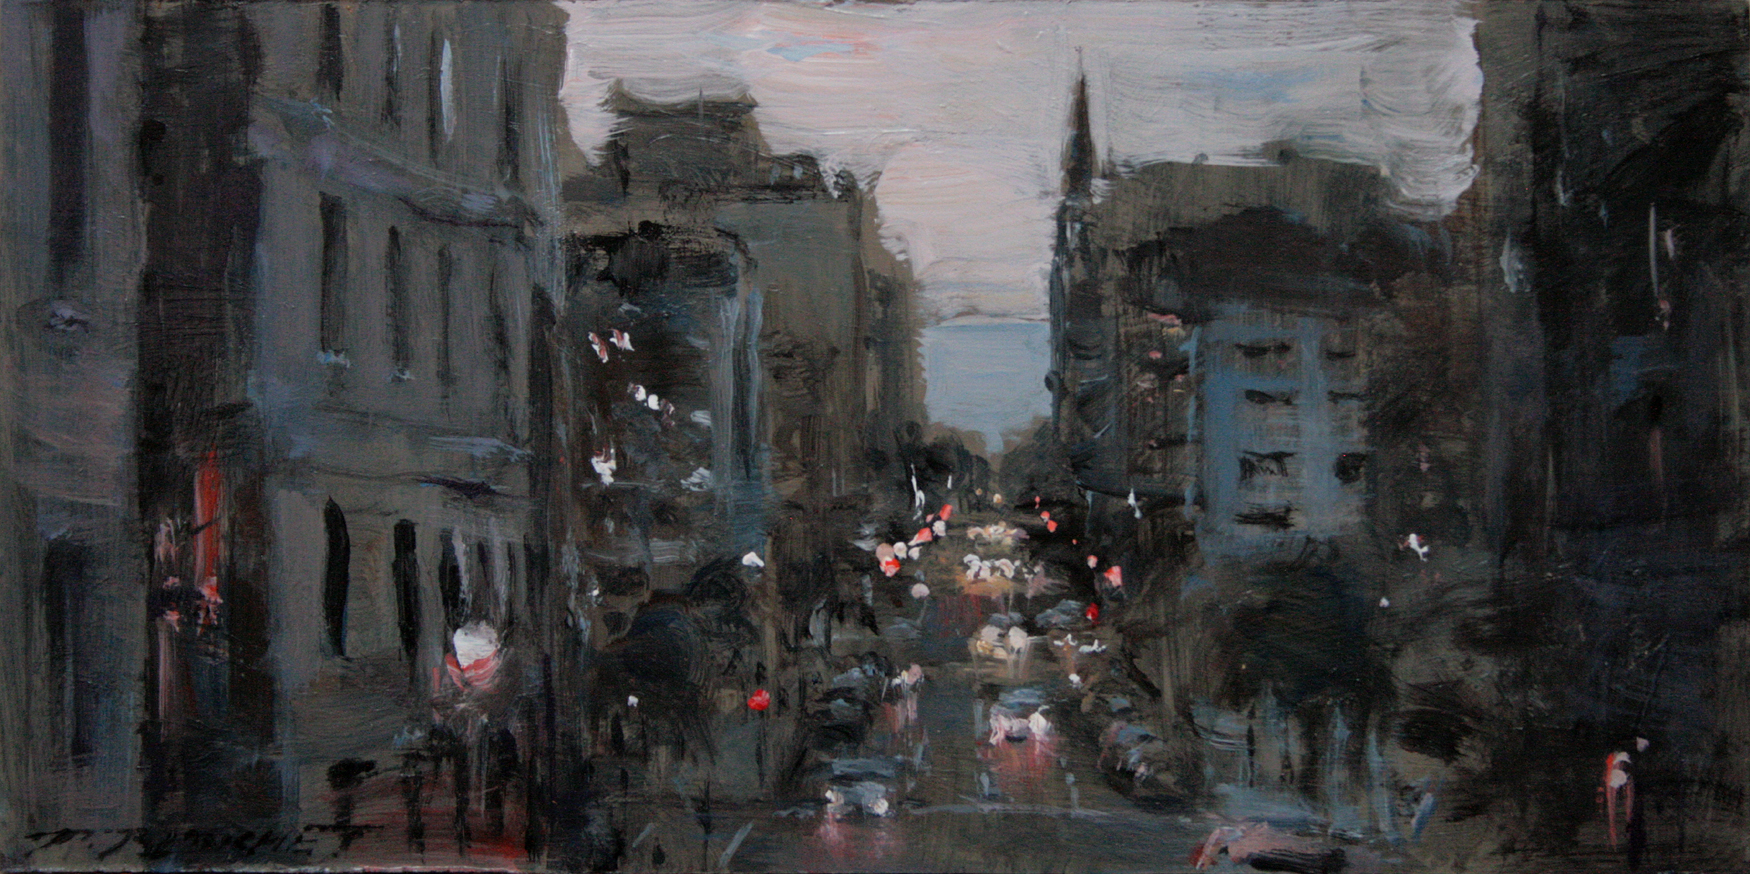 Rue St-Denis, 6x12